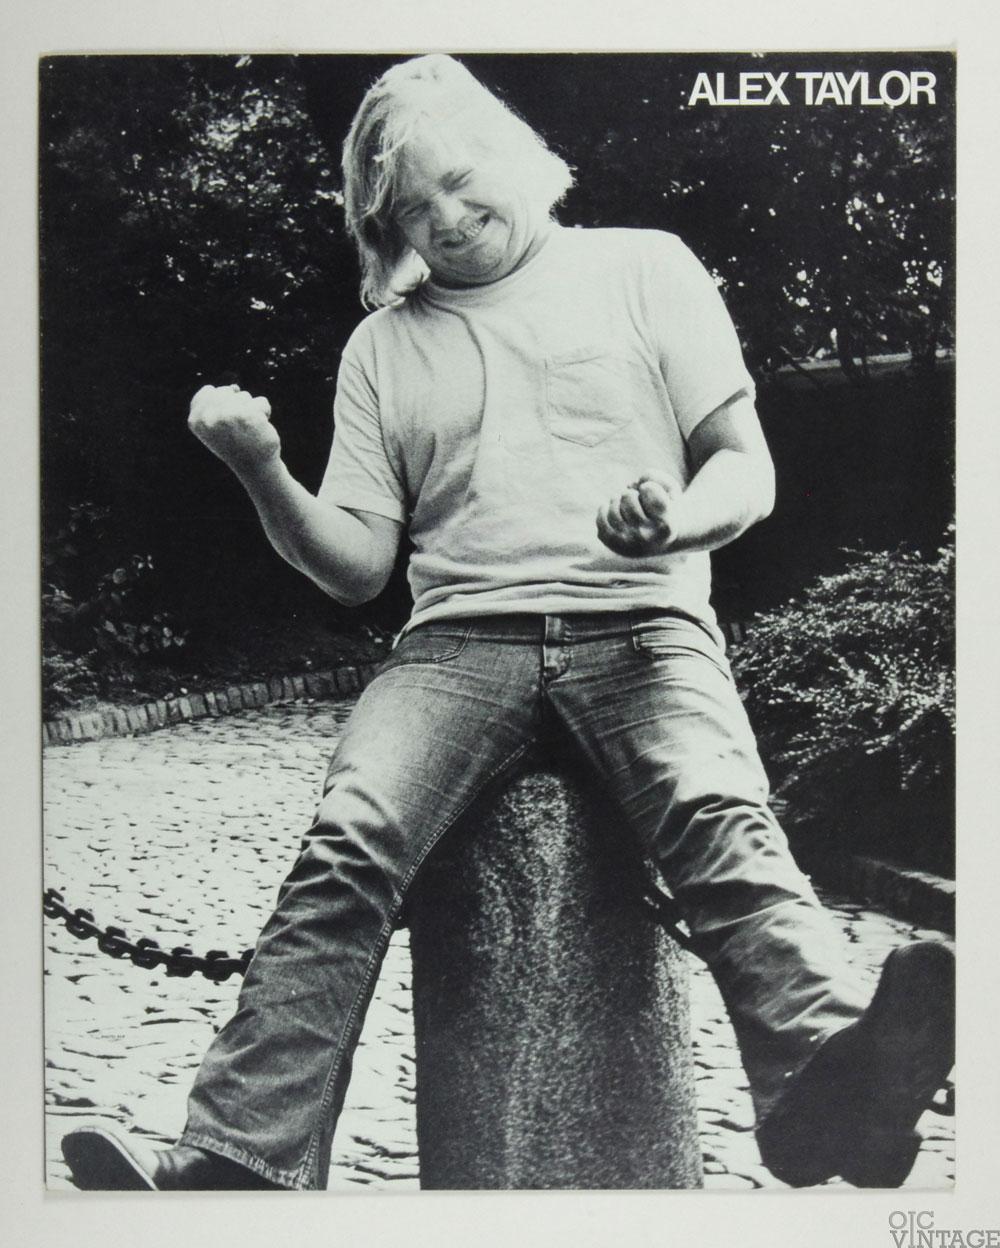 Alex Taylor Poster Cardboard Dinnertime 1972 New Album Promo B/W 22 x 27